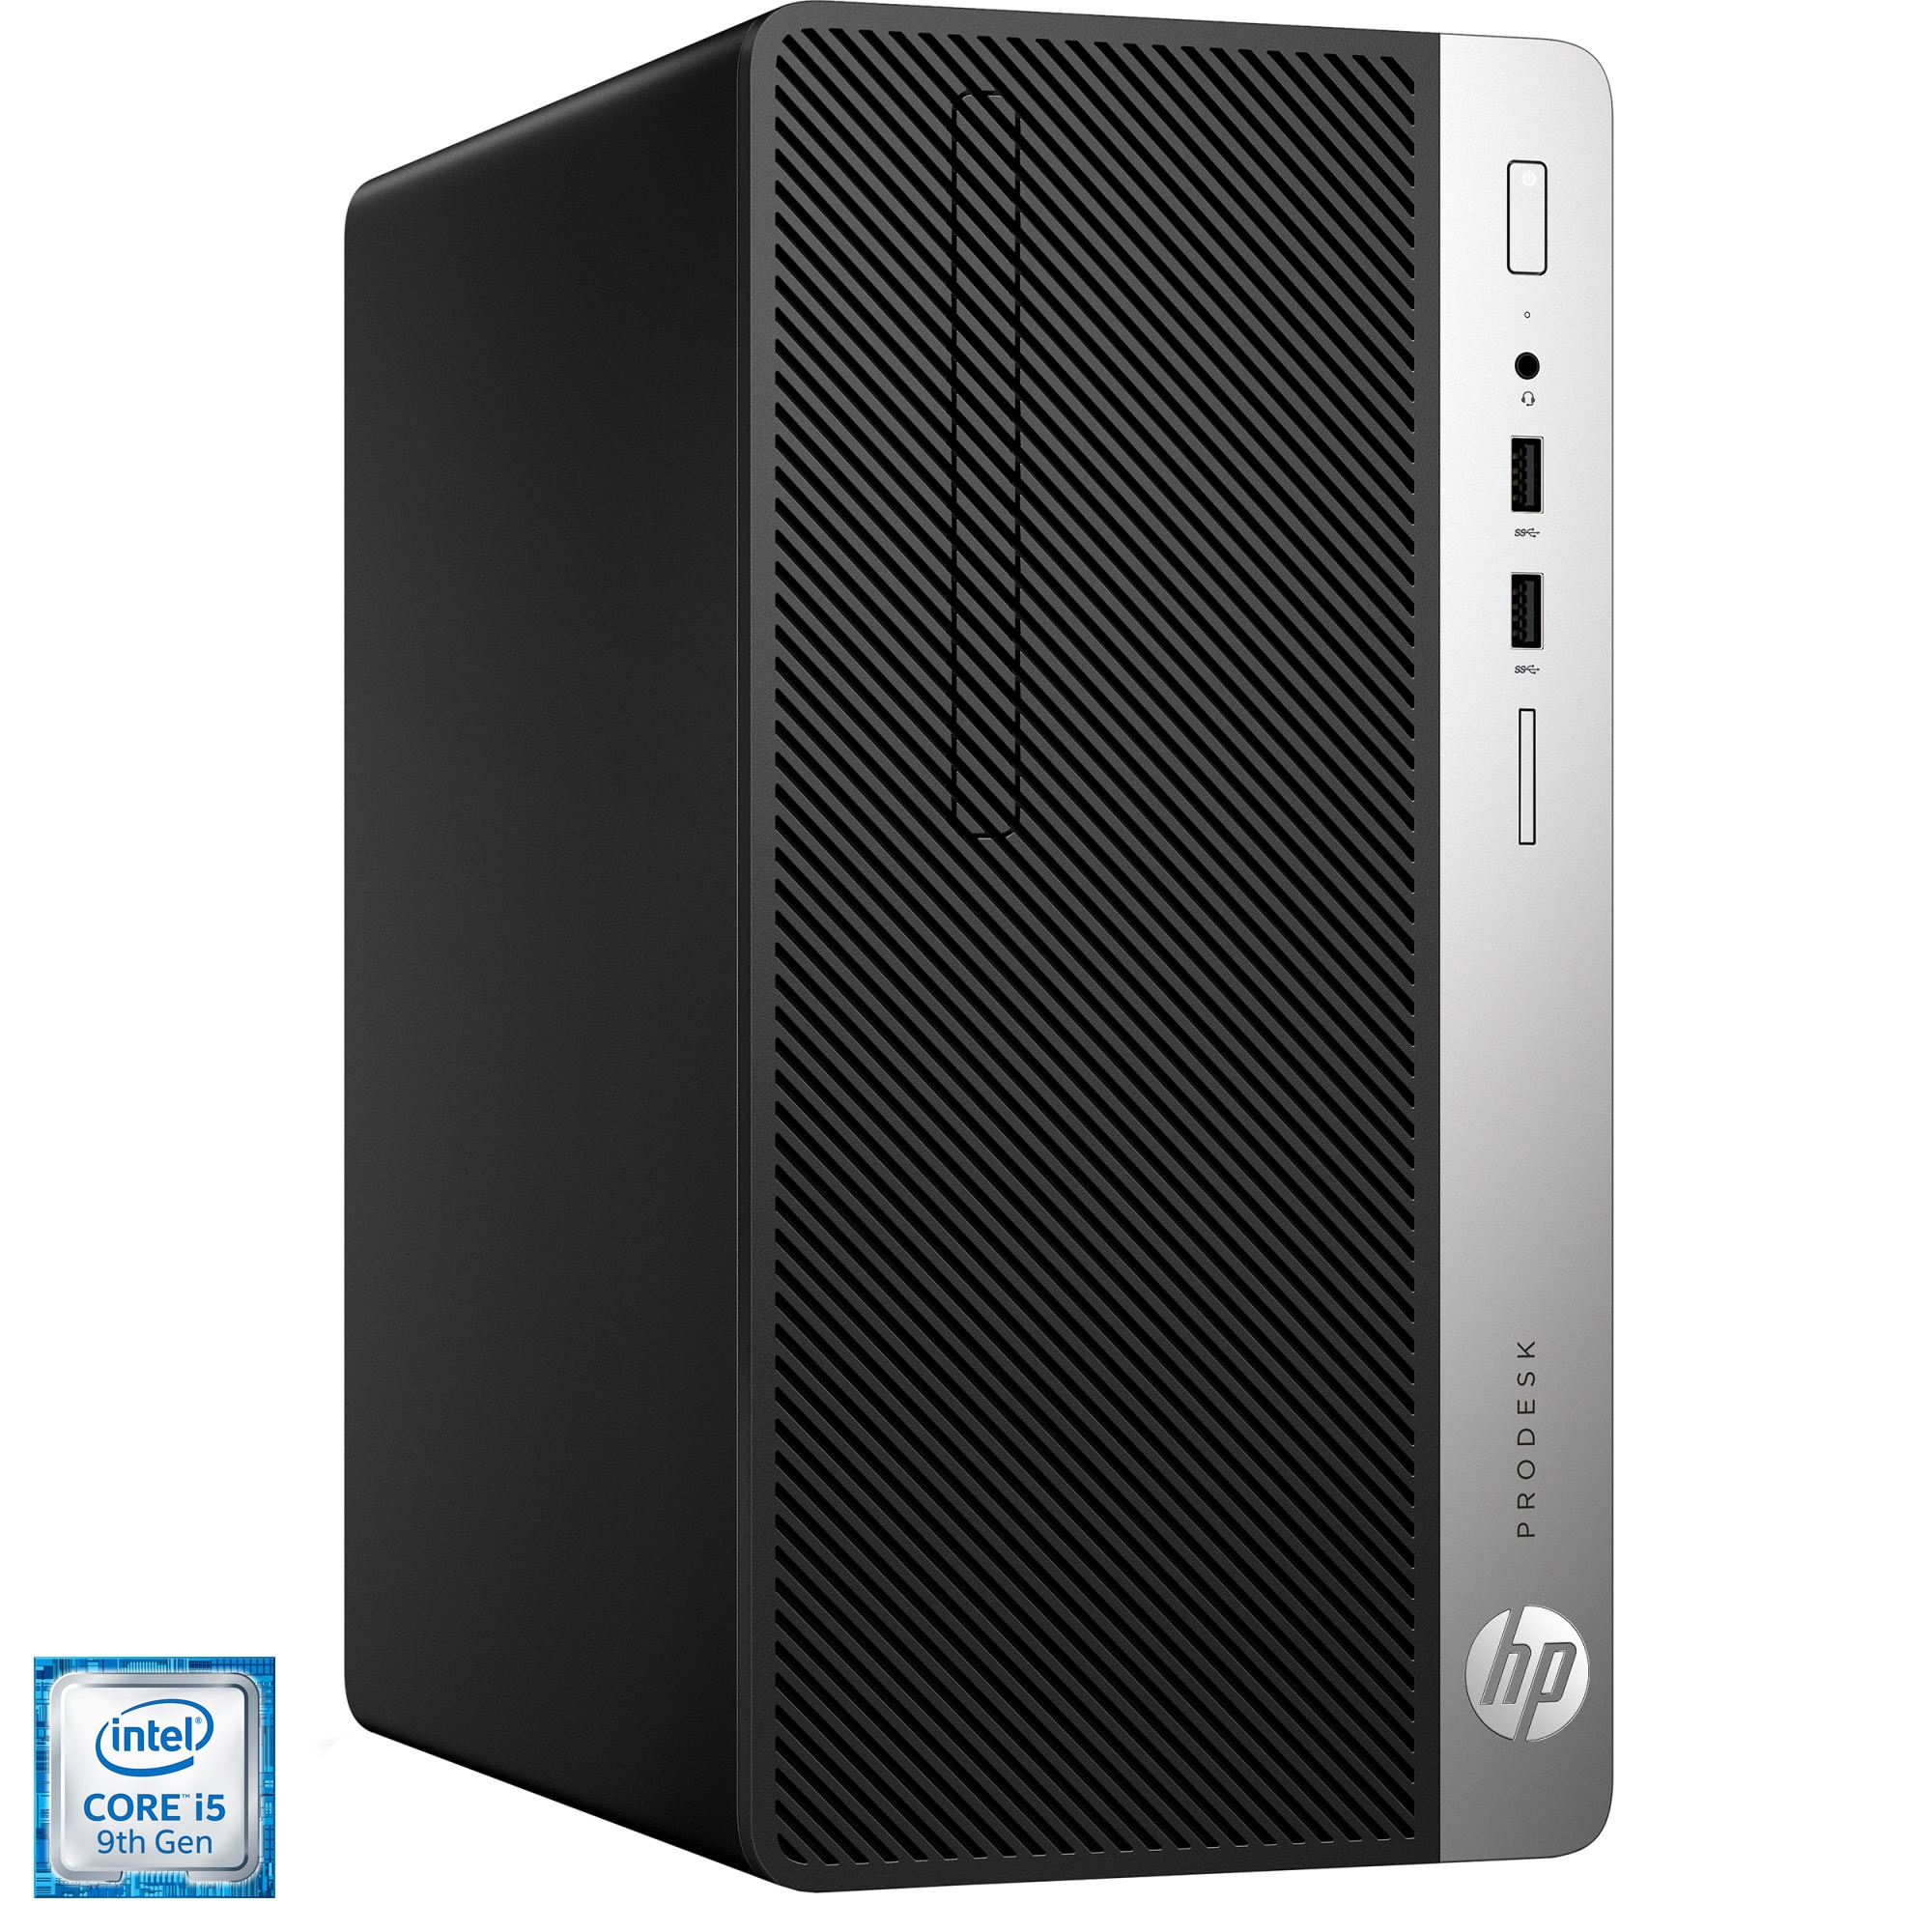 Fotografie Sistem Desktop PC HP ProDesk 400 G6 MT cu procesor Intel® Core™ i5-9400F pana la 4.10 GHz, 8GB DDR4, 512 GB PCIe® NVMe™ SSD, AMD Radeon R7 430 2GB, Microsoft Windows 10 Pro, Mouse + Tastatura